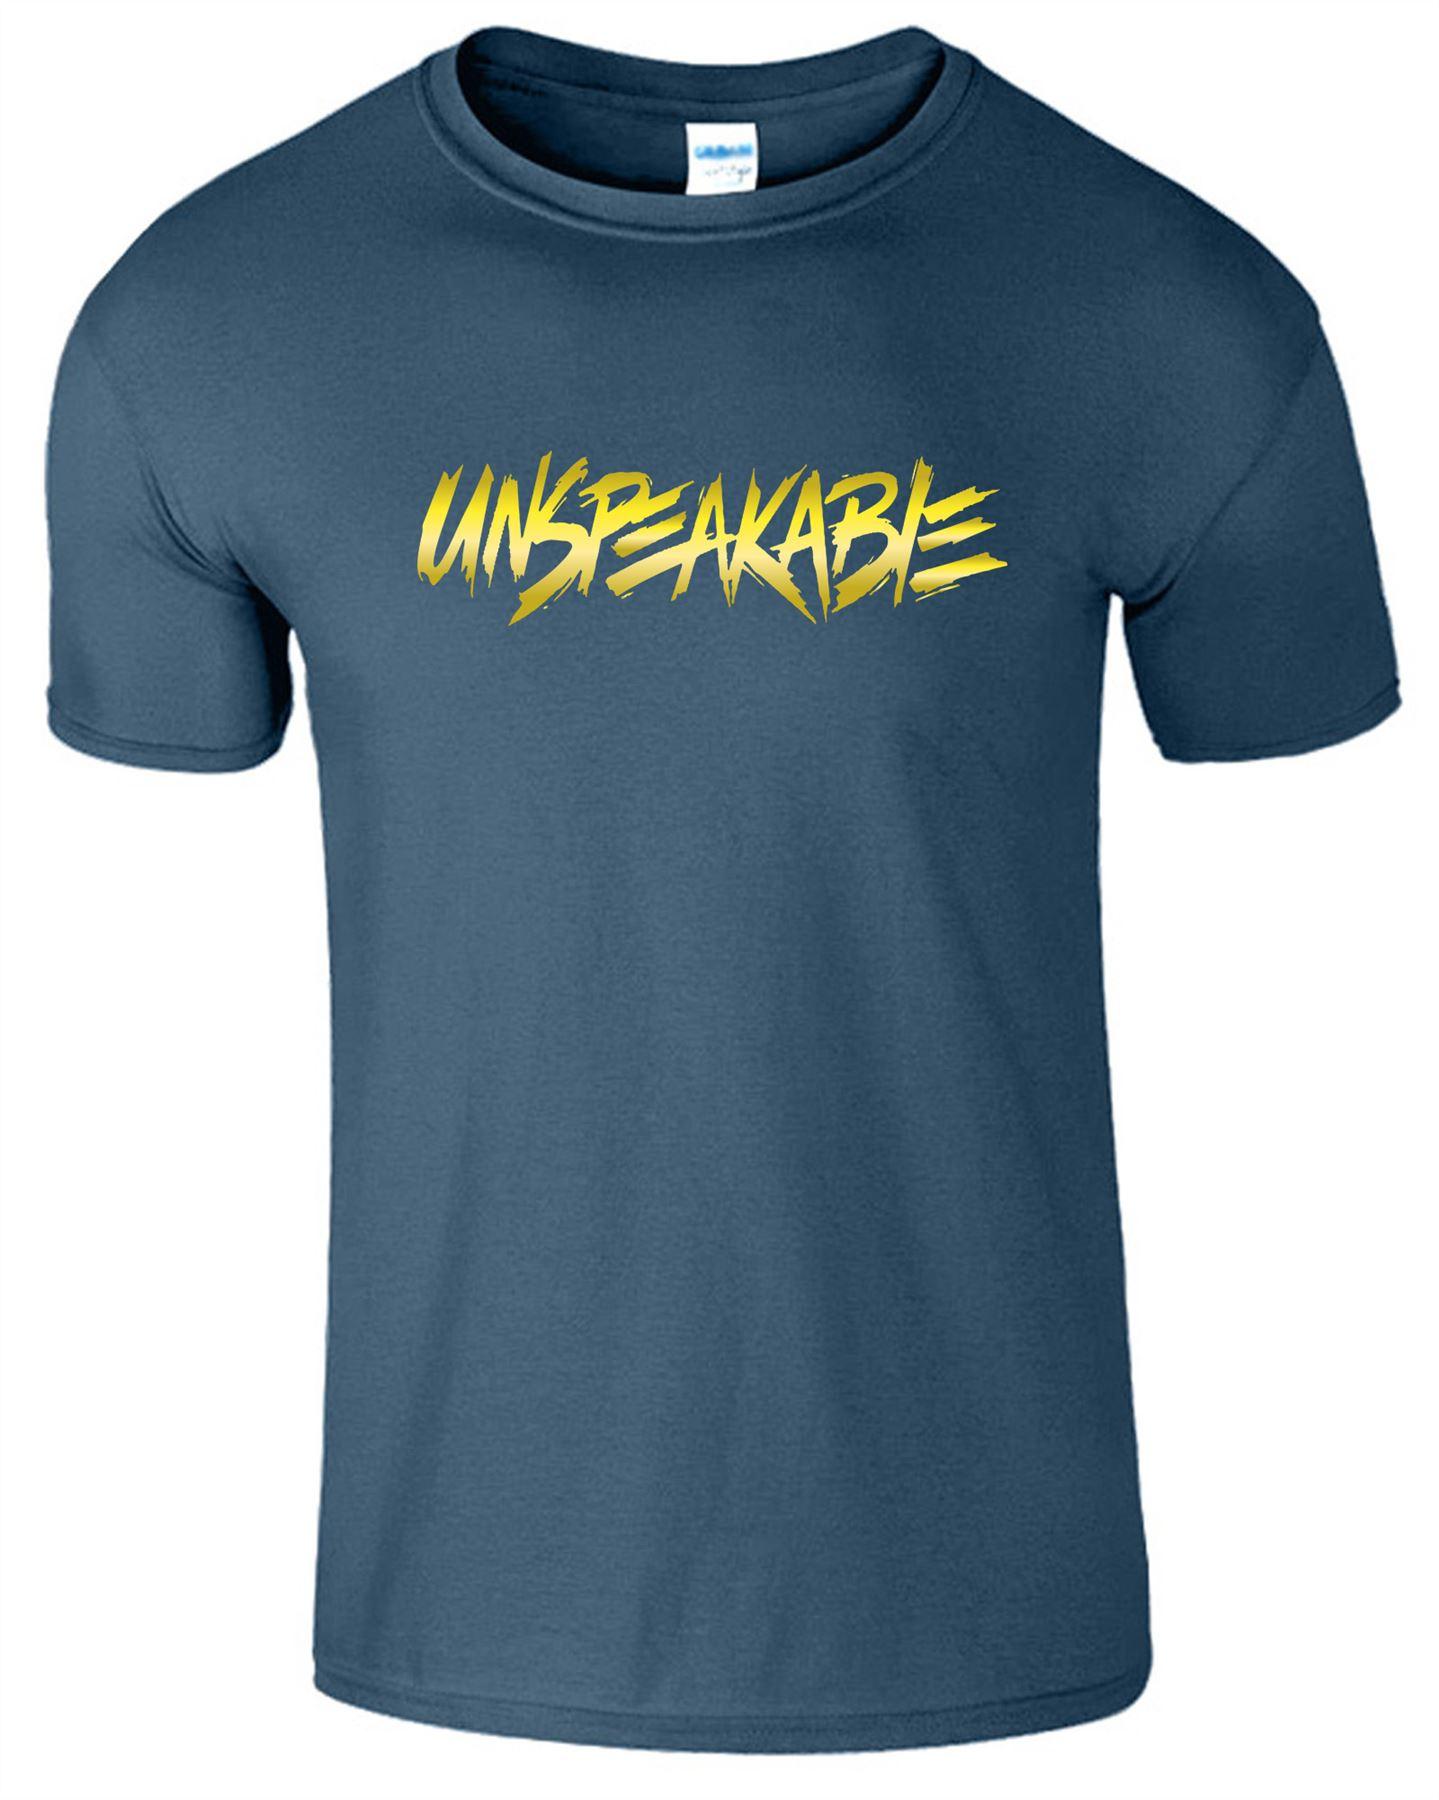 Cheap Sale Unspeakable Kids White T Shirt Childrens Gaming Unspeakablegaming Pancake Bot T-shirts, Tops & Shirts